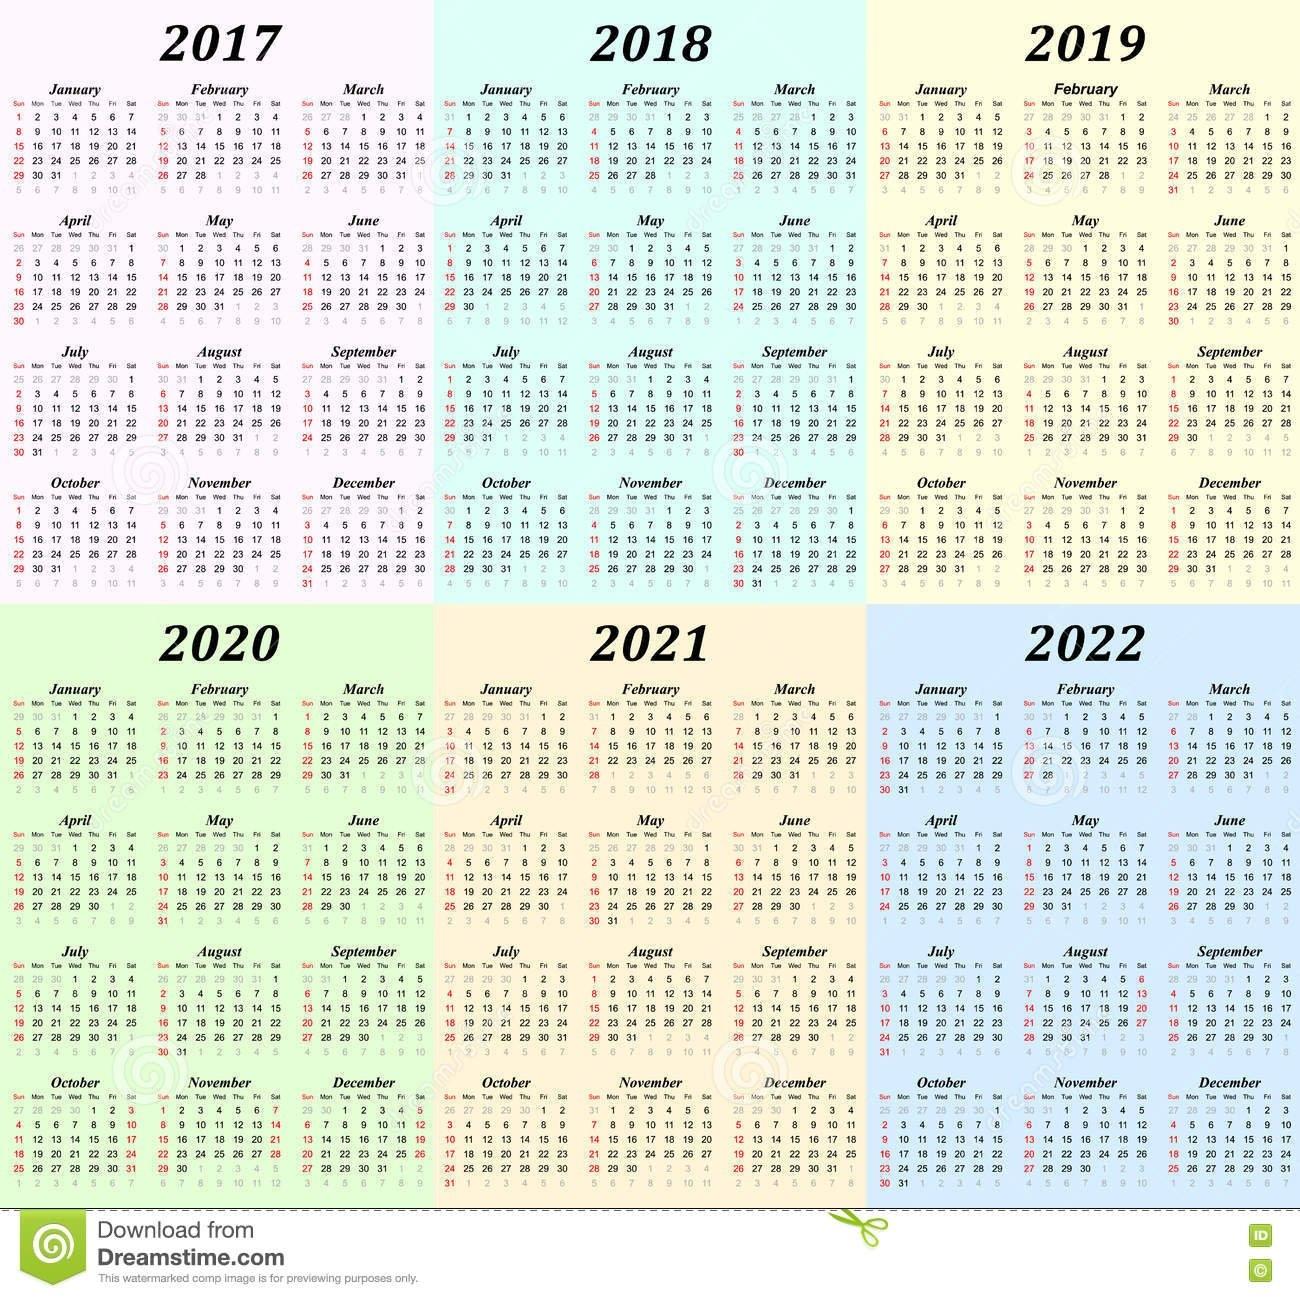 5 Year Calendar 2019 To 2023 – Littledelhisf 5 Year Calendar 2019 To 2023